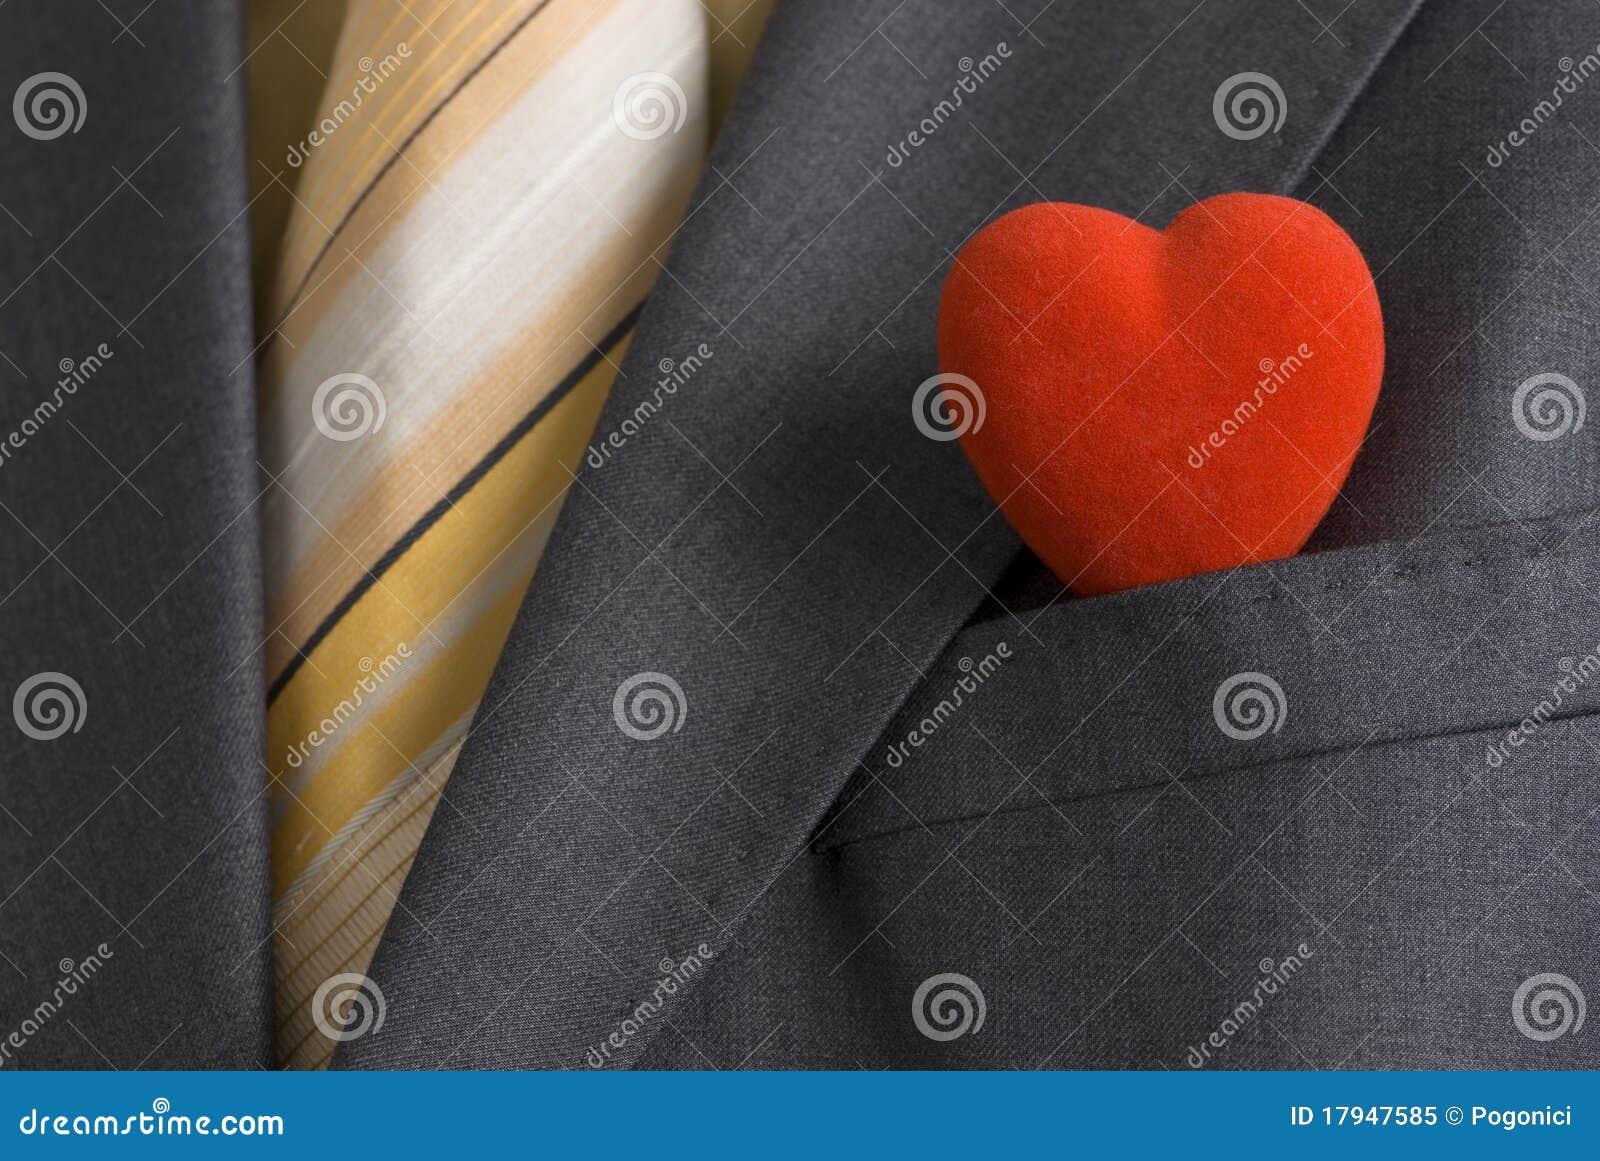 Mr. Valentine s business card